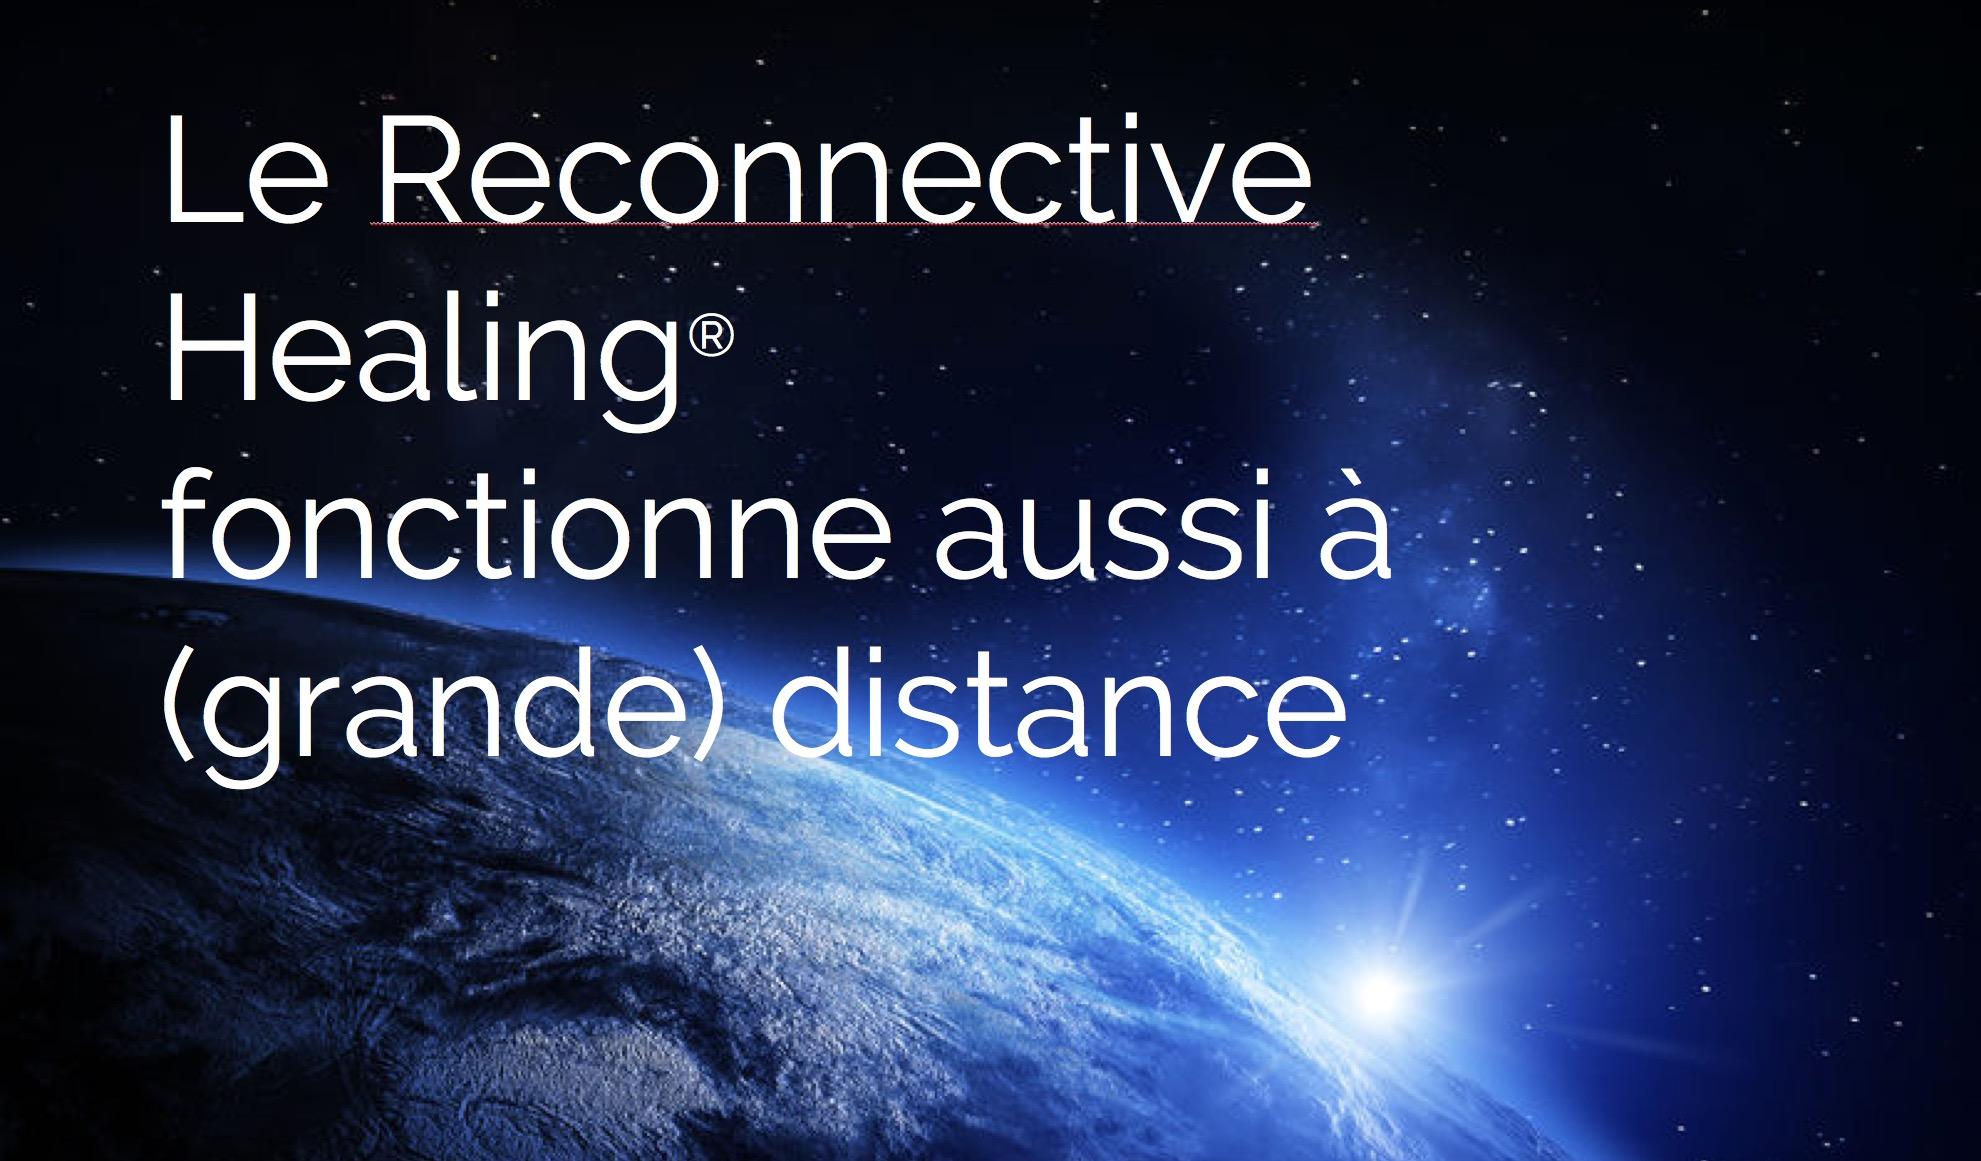 Grande distance